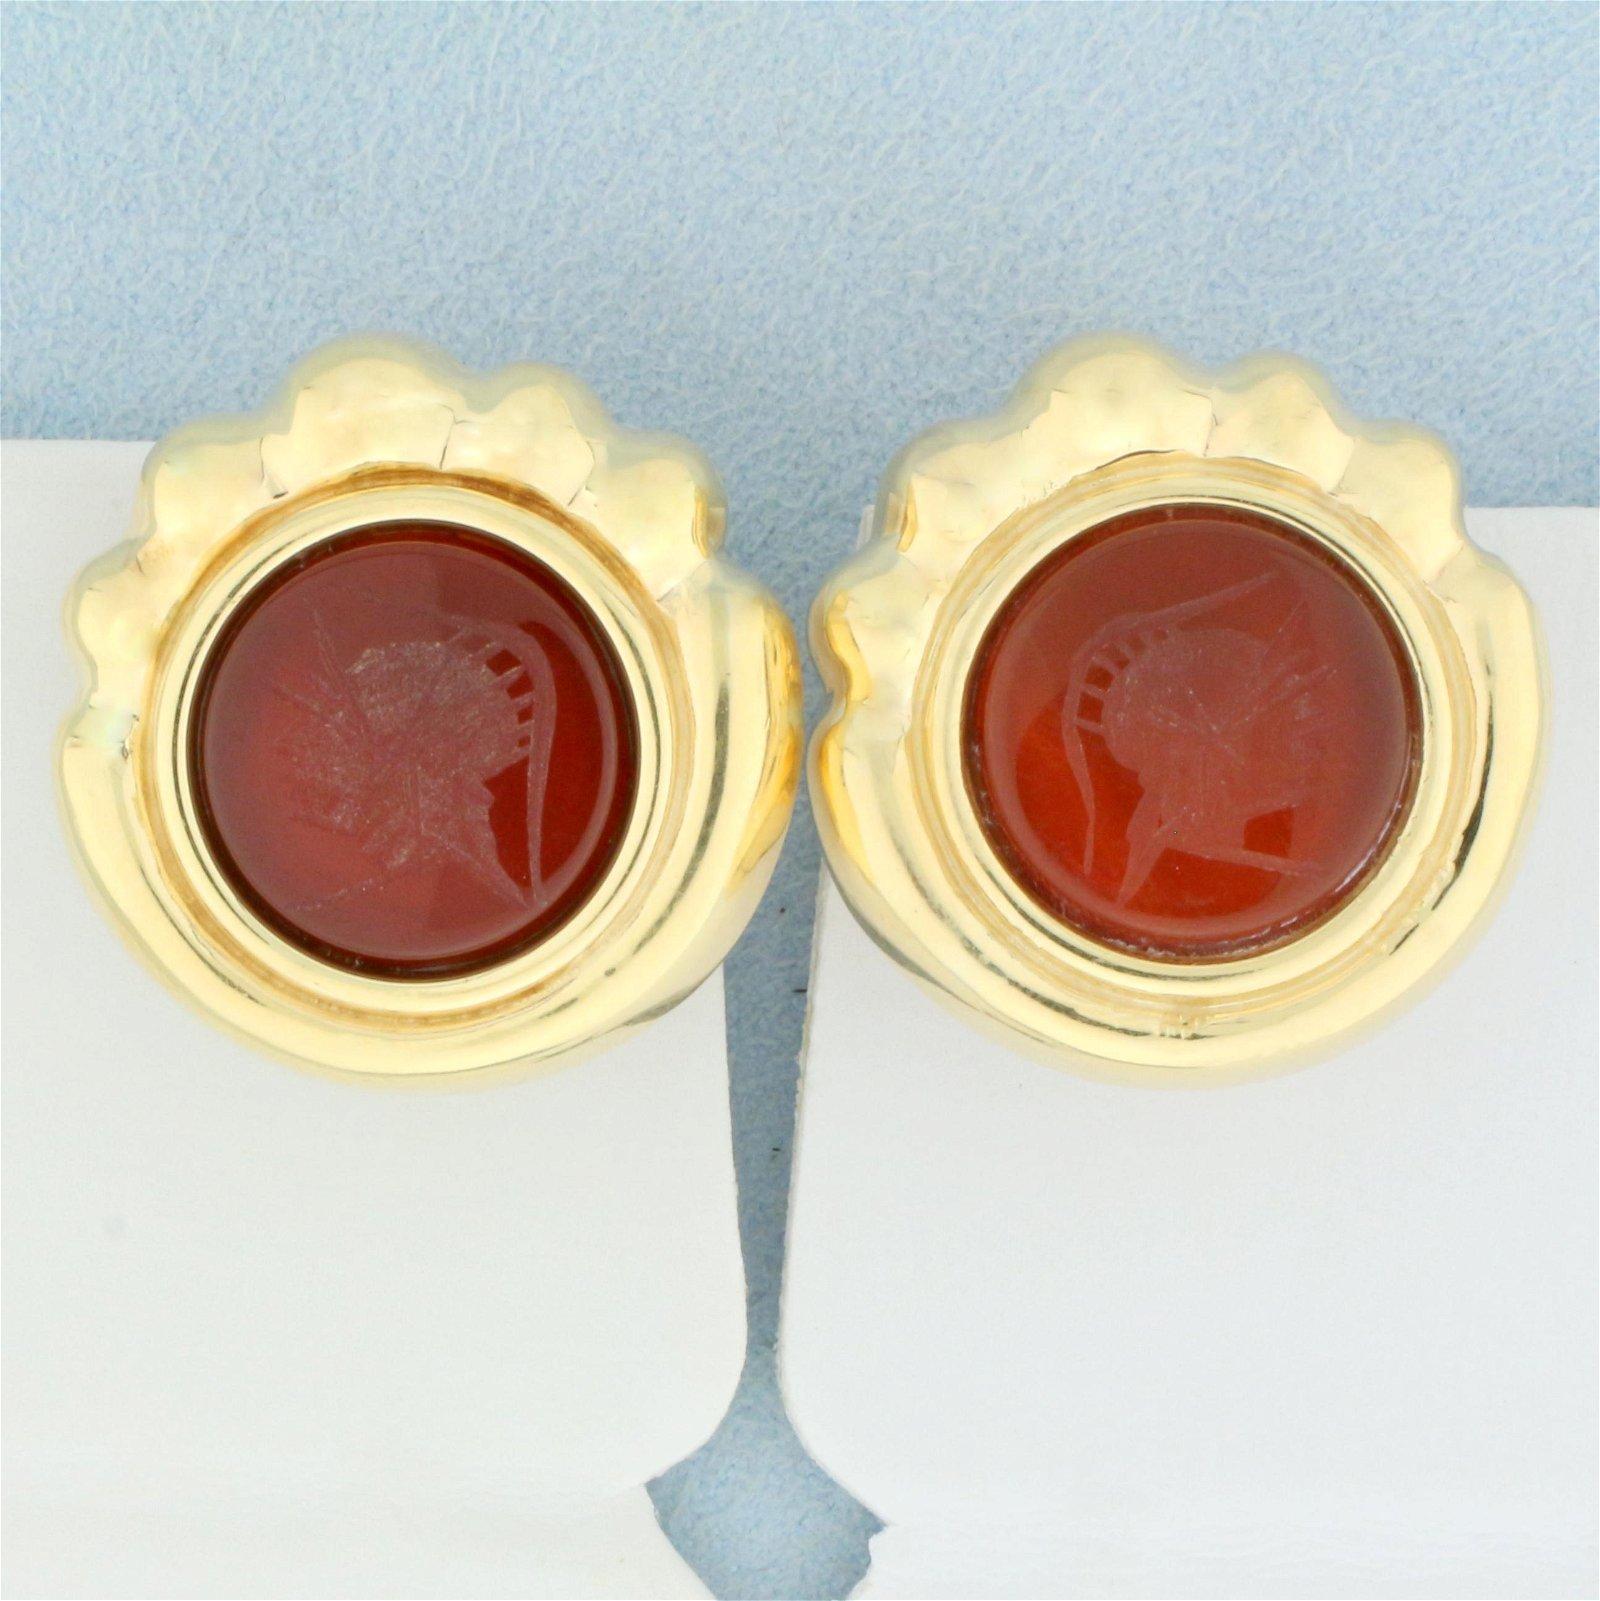 Large Statement Cameo Carnelian Earrings in 14K Yellow